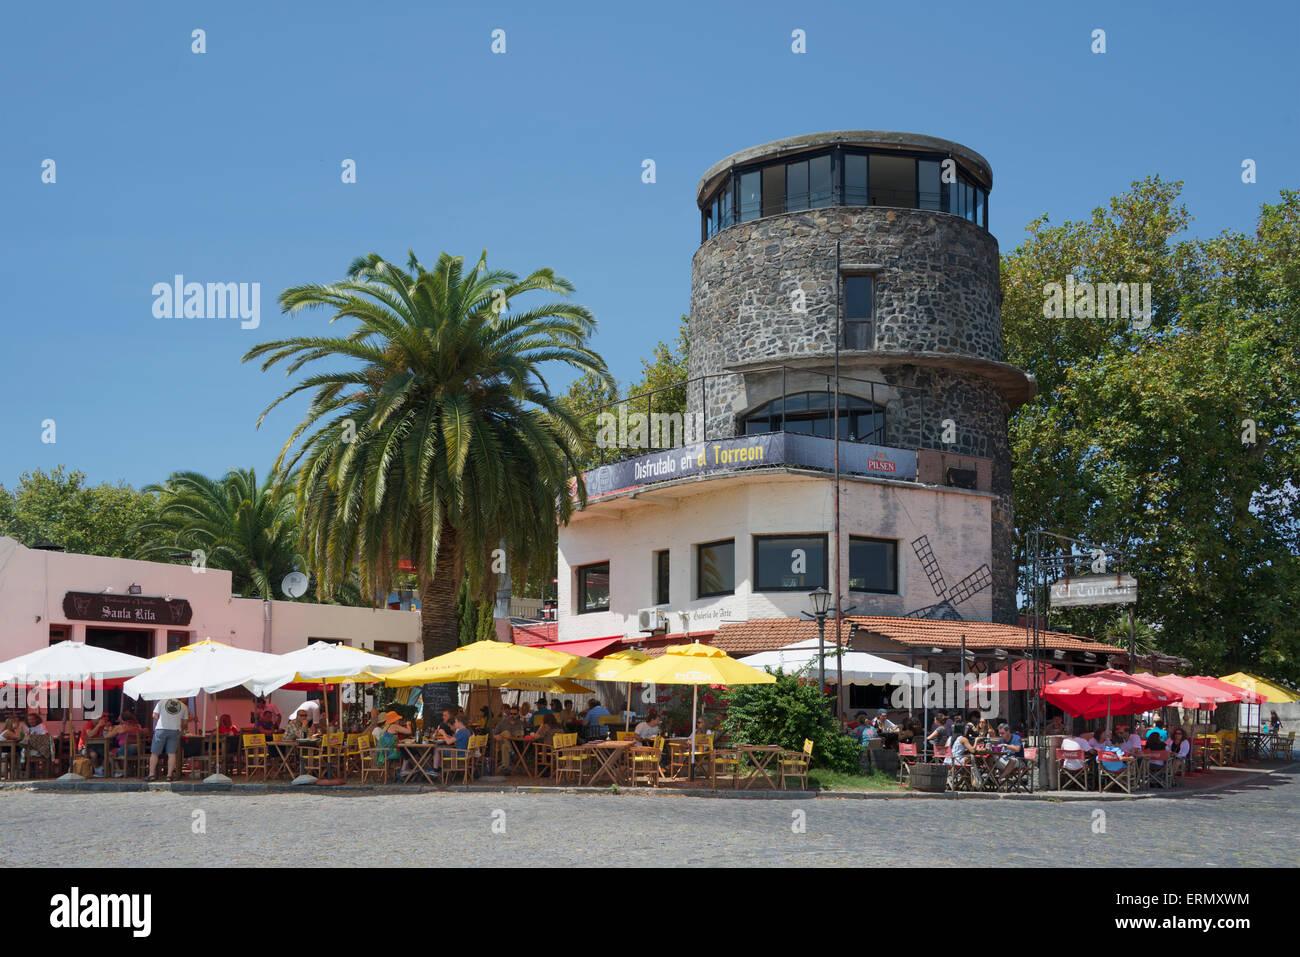 People enjoying lunch El Torreon Restaurant historic colonial quarter Colonia del Sacramento Uruguay - Stock Image